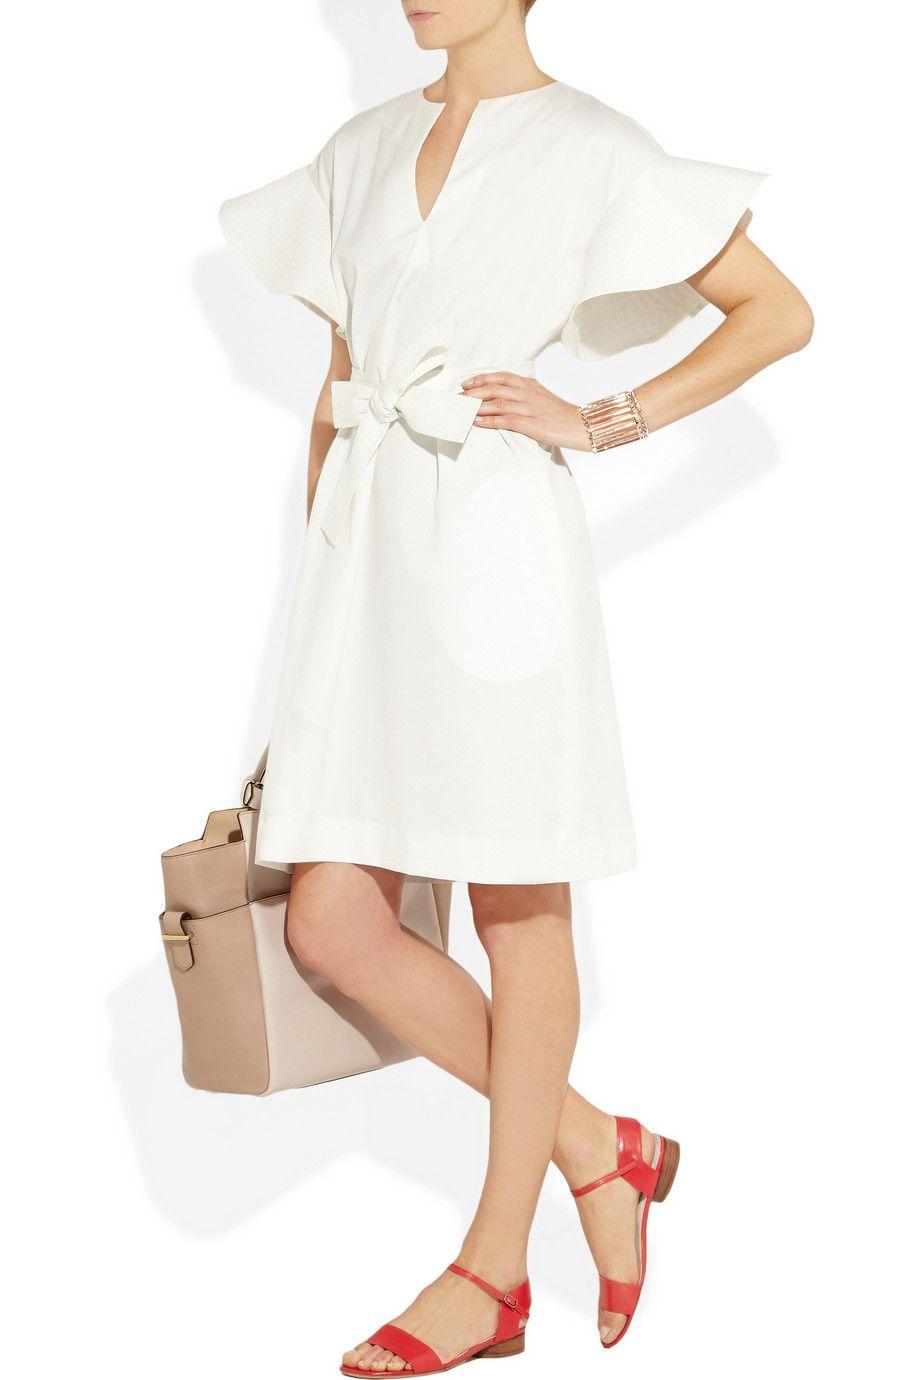 Chloé Rufflesleeve grosgrain dress